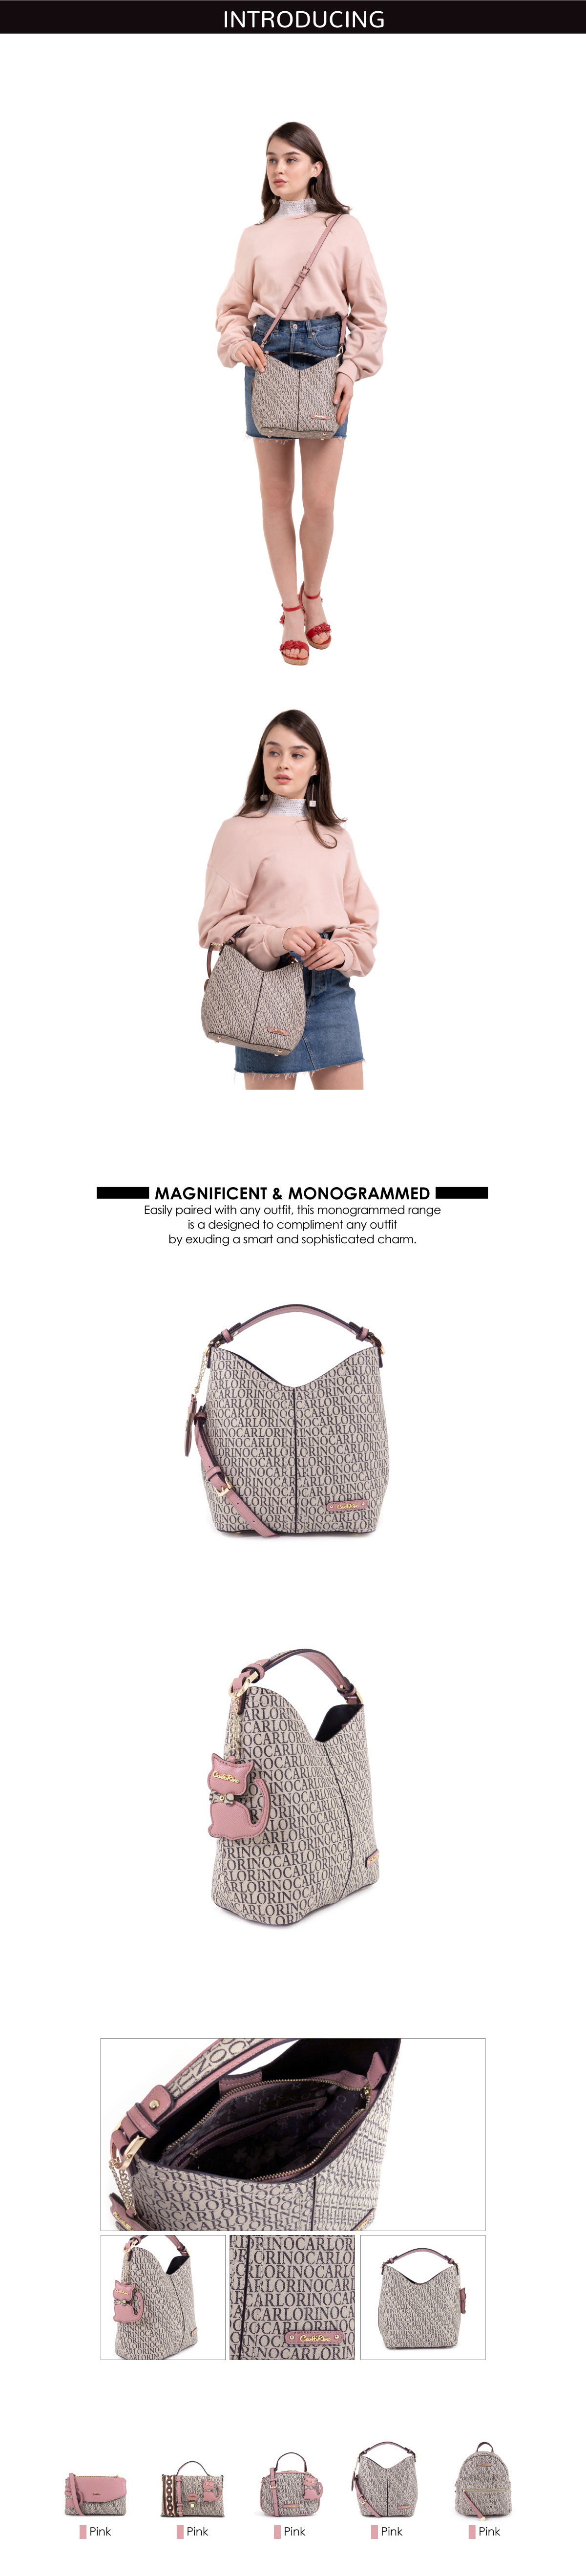 0304679E 004 24 - Kitty Charmed Top Handle Bucket Bag